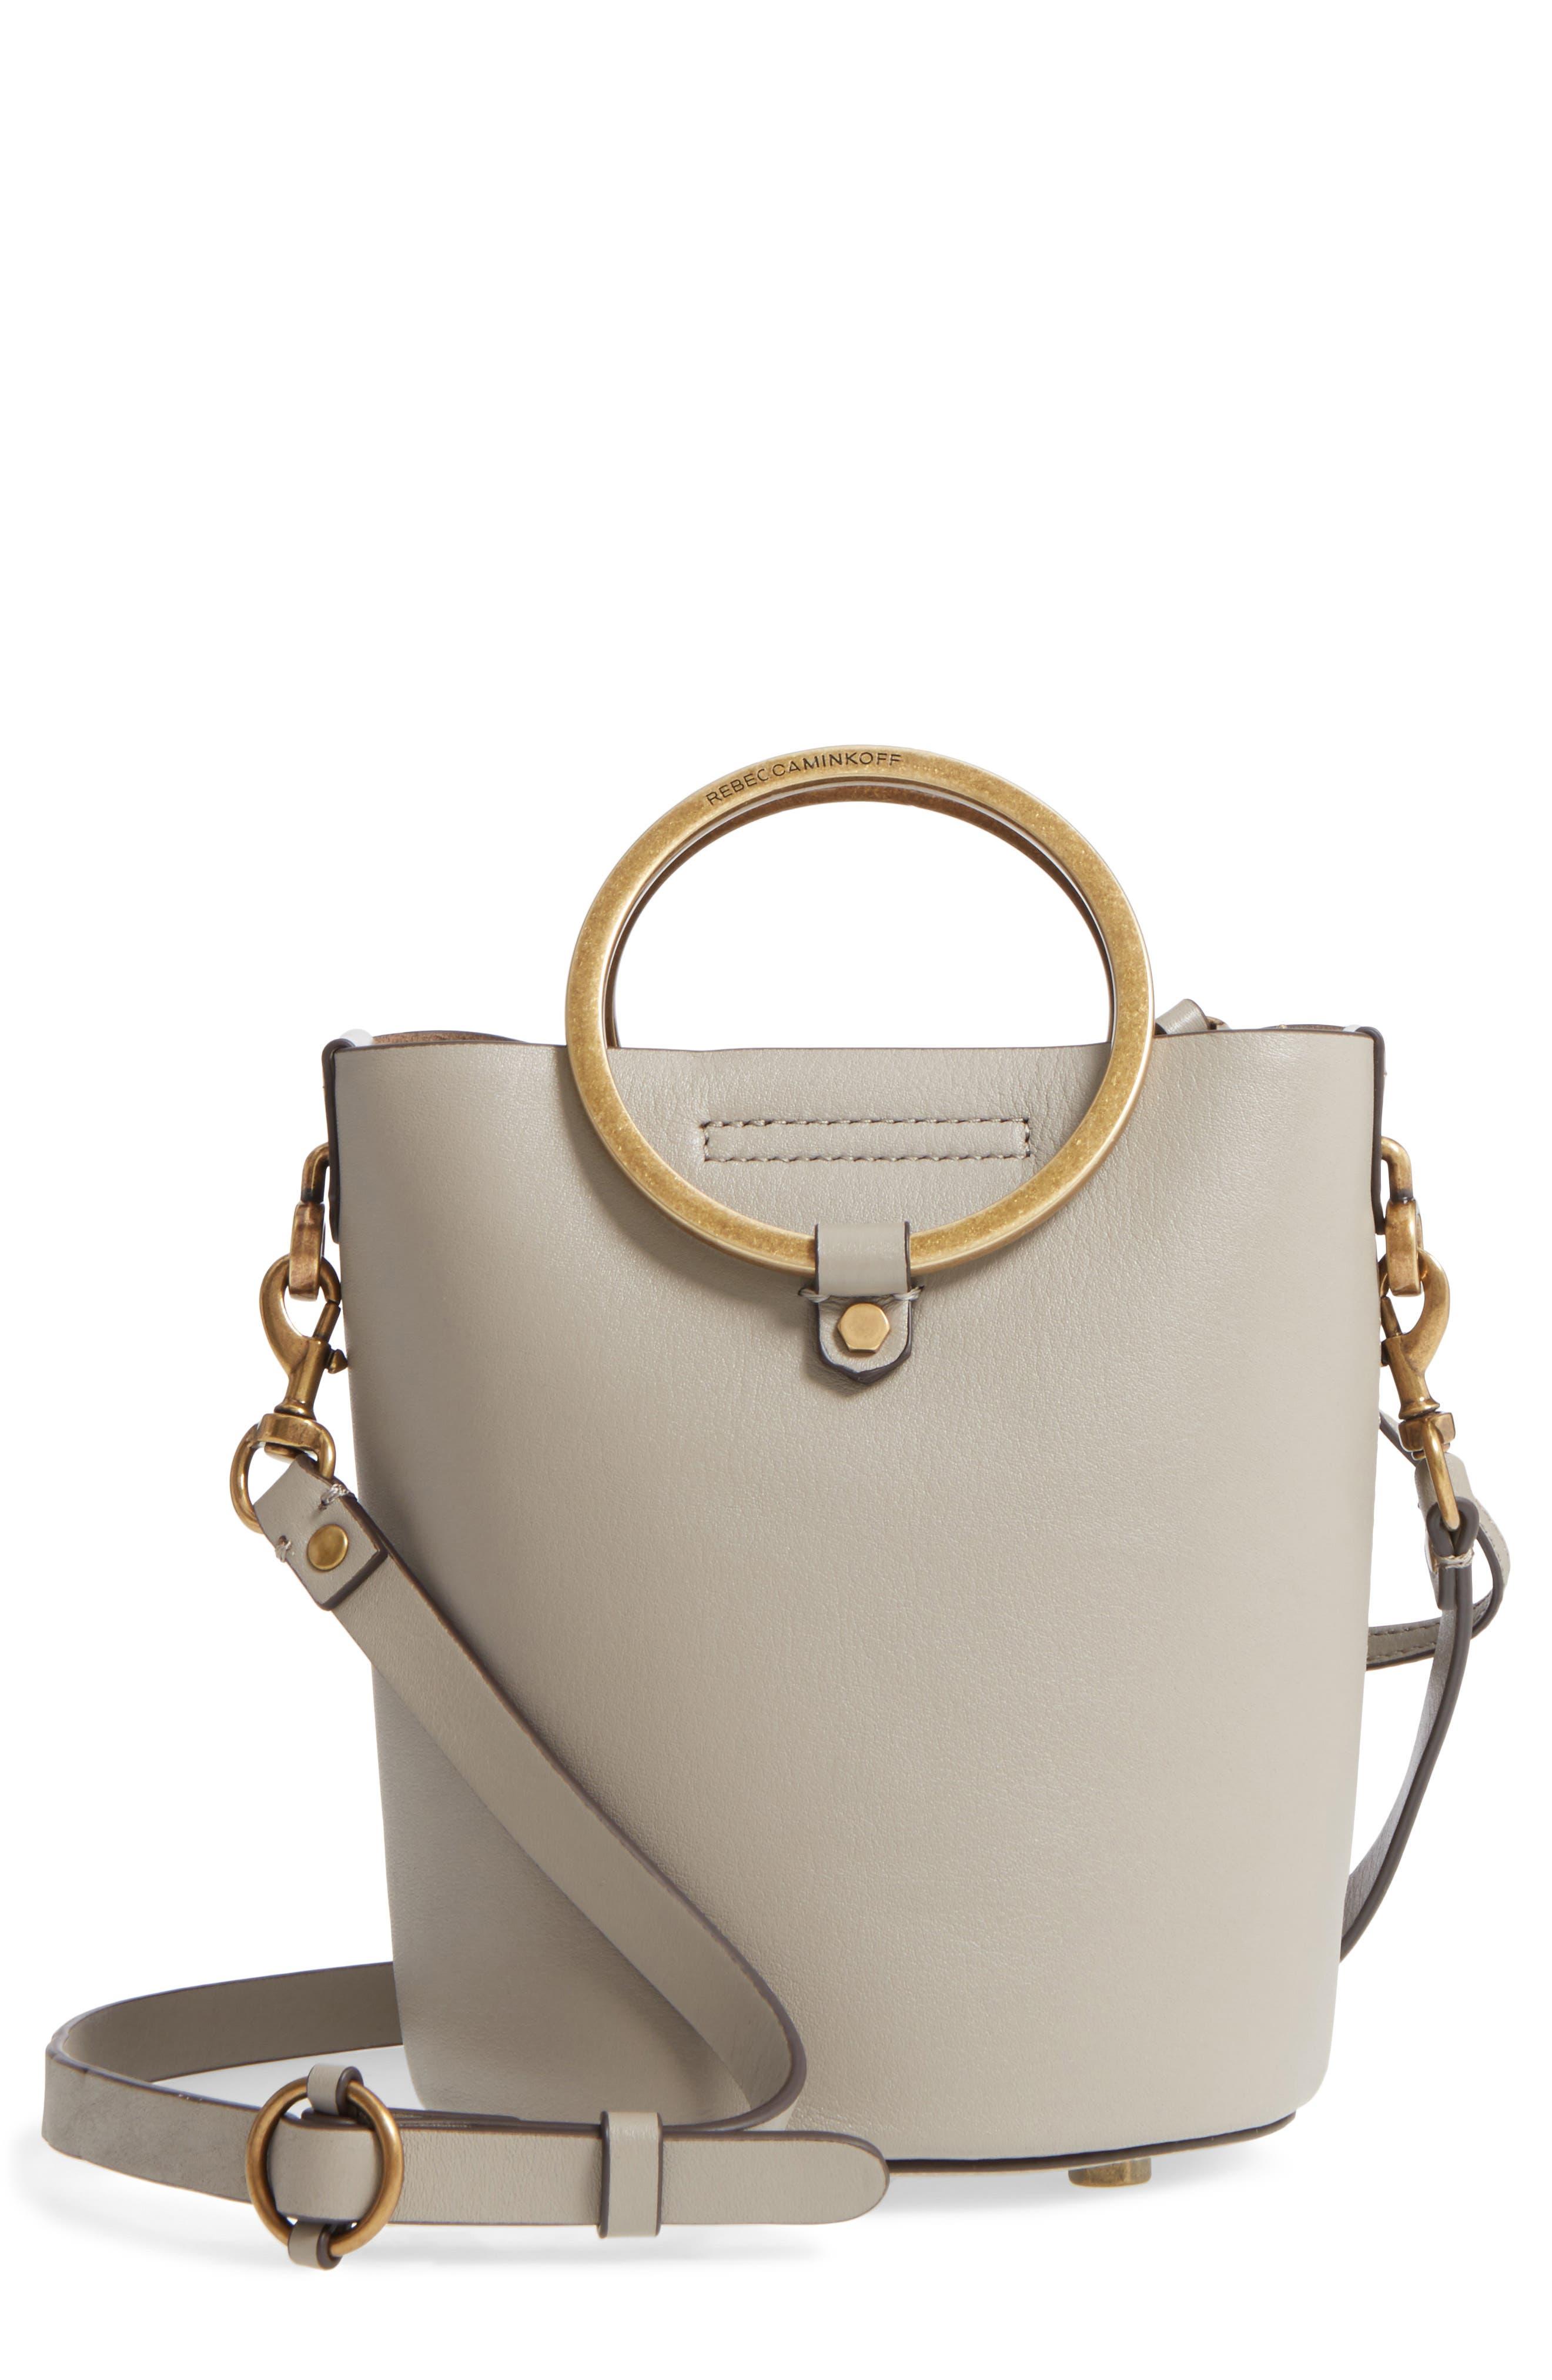 Rebecca Minkoff Ring Leather Bucket Bag